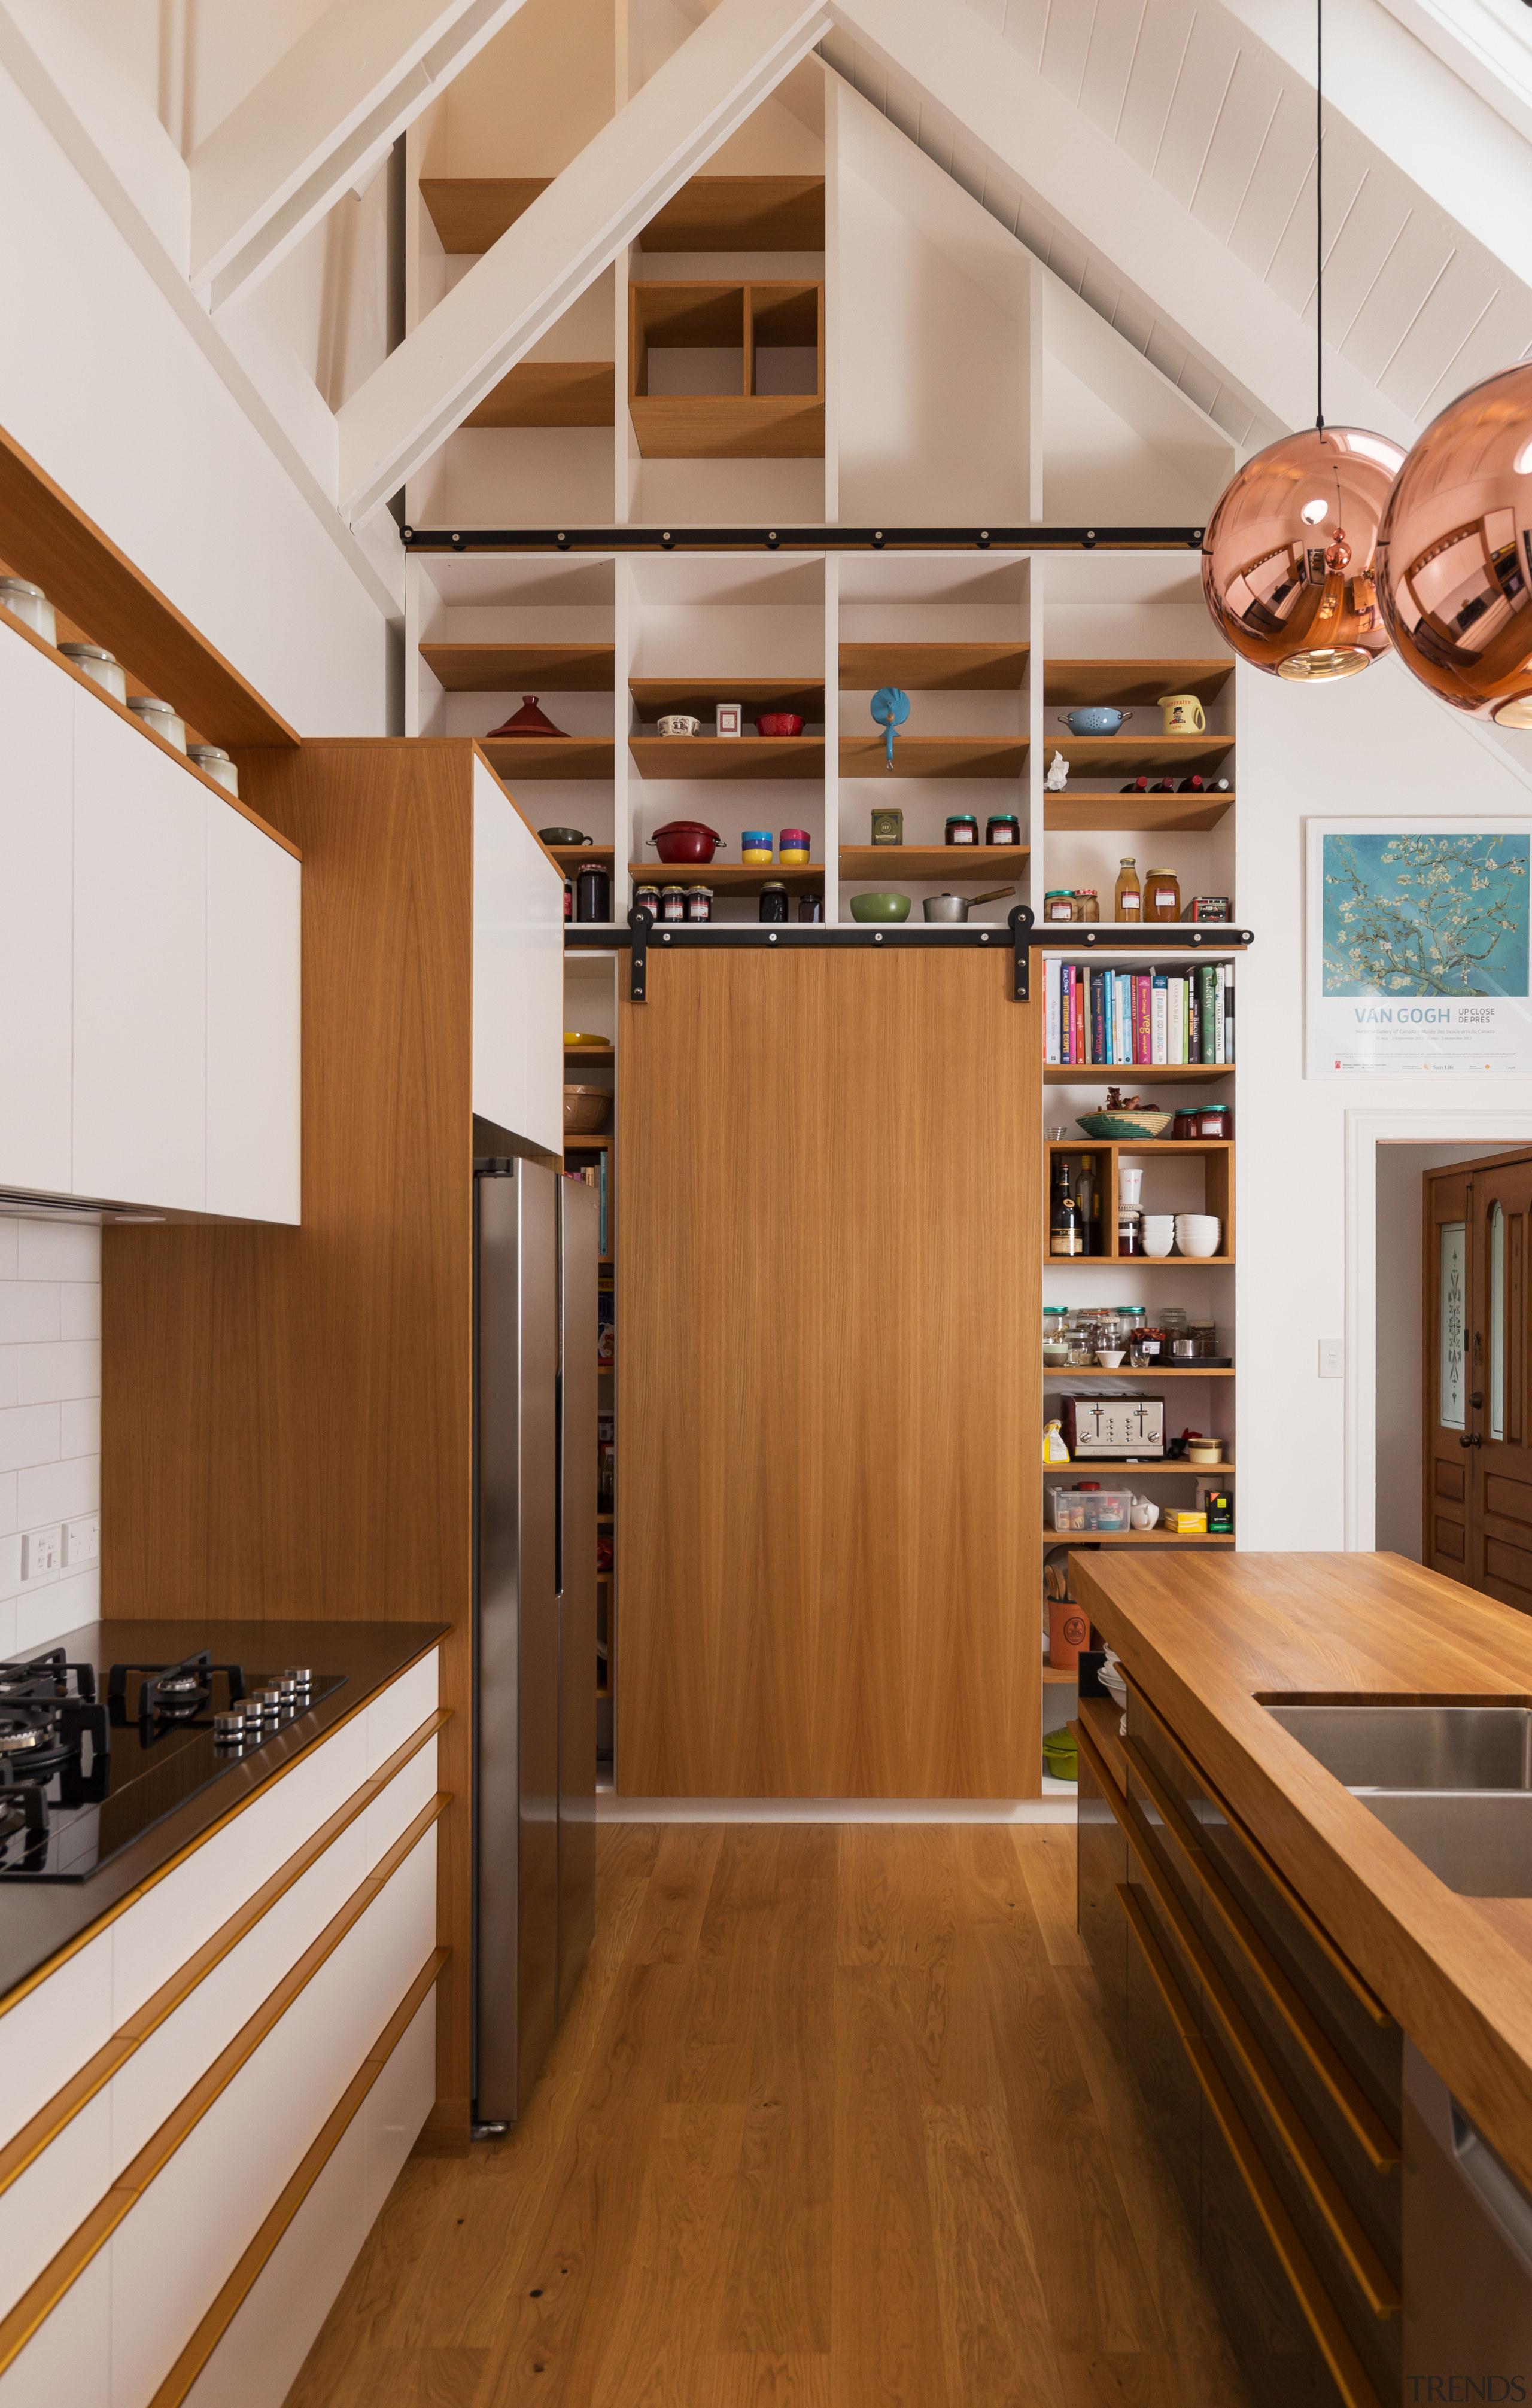 Wooden kitchen cabinetry and living room timber shelves cabinetry, countertop, floor, flooring, hardwood, interior design, kitchen, shelf, shelving, wood, wood flooring, brown, gray, cabinetry, RH Cabinetmakers